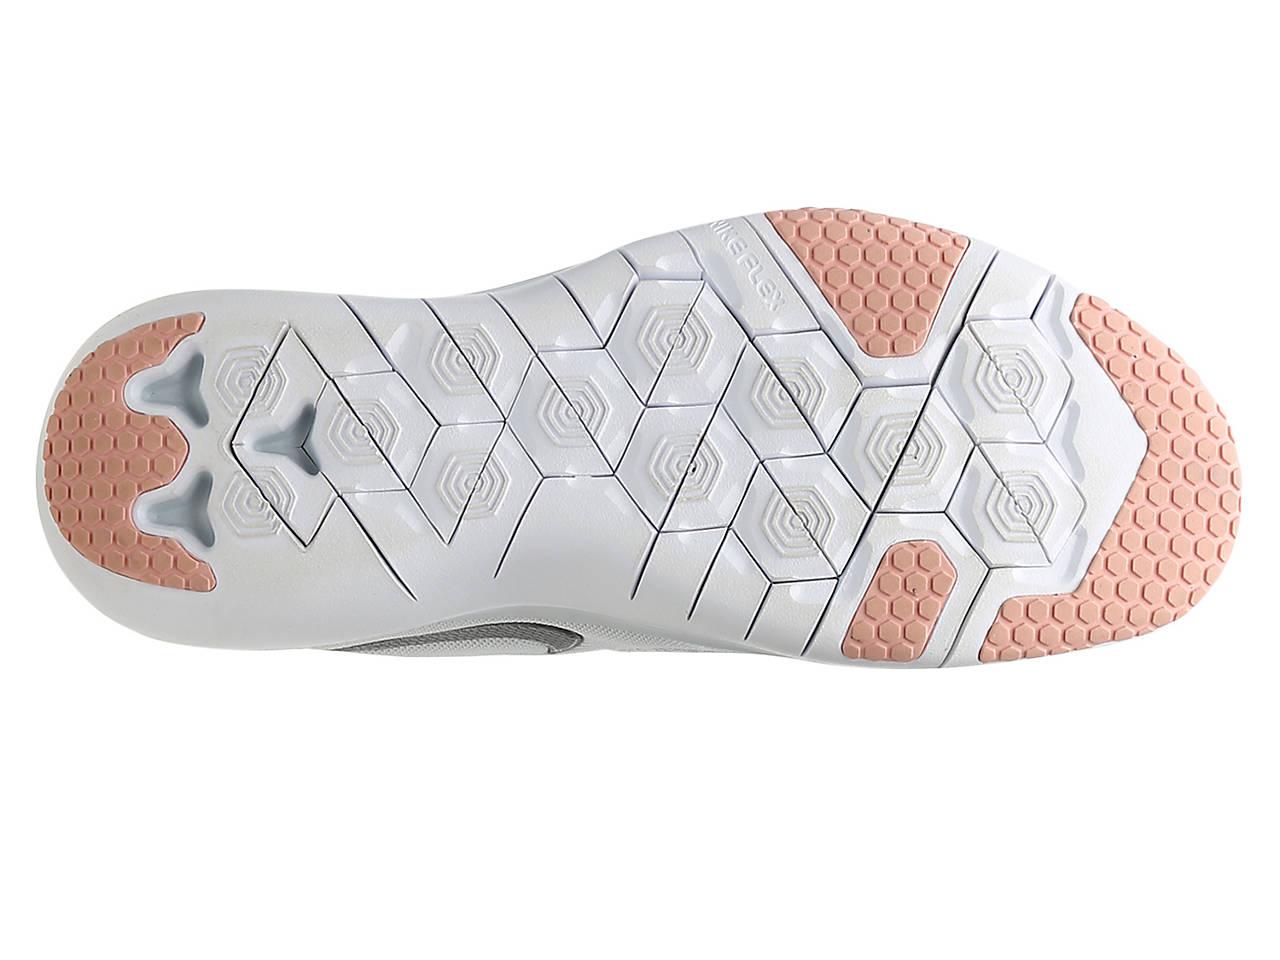 ca555ac39b37c Nike Flex Supreme 6 Lightweight Training Shoe - Women s Women s ...